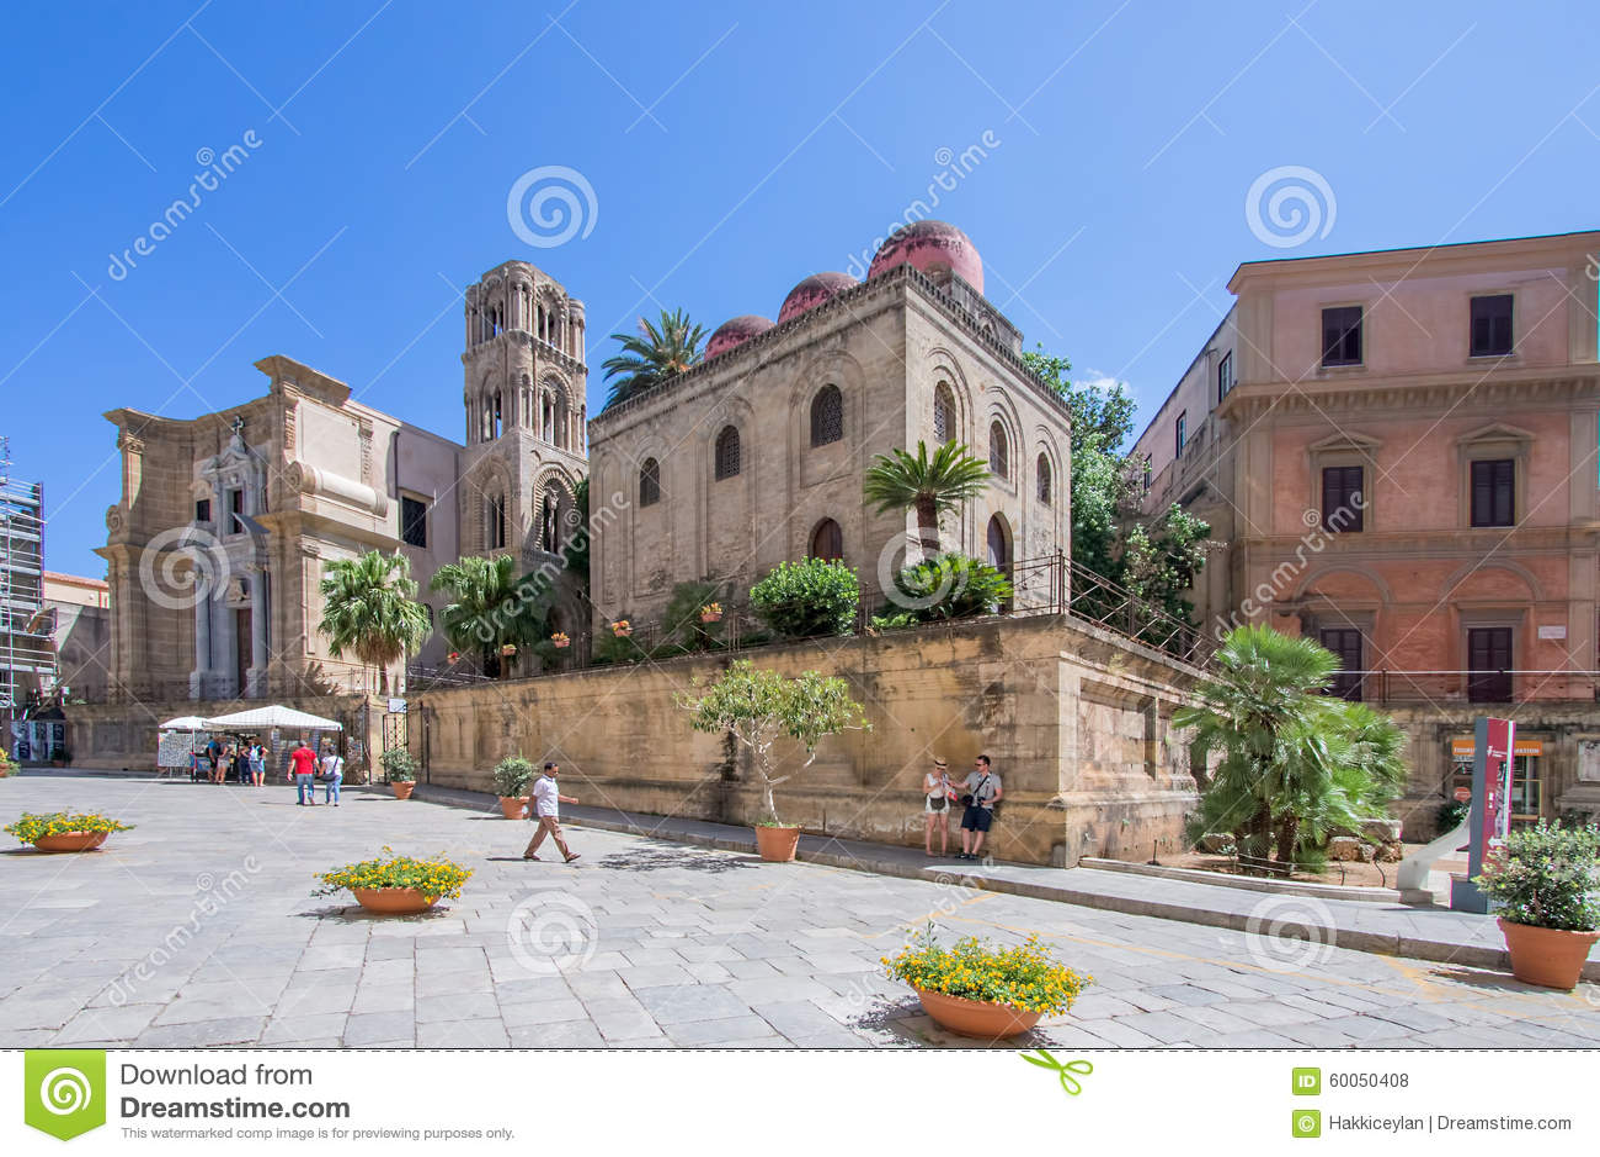 Sonnige Piazza in Palermo, Italien